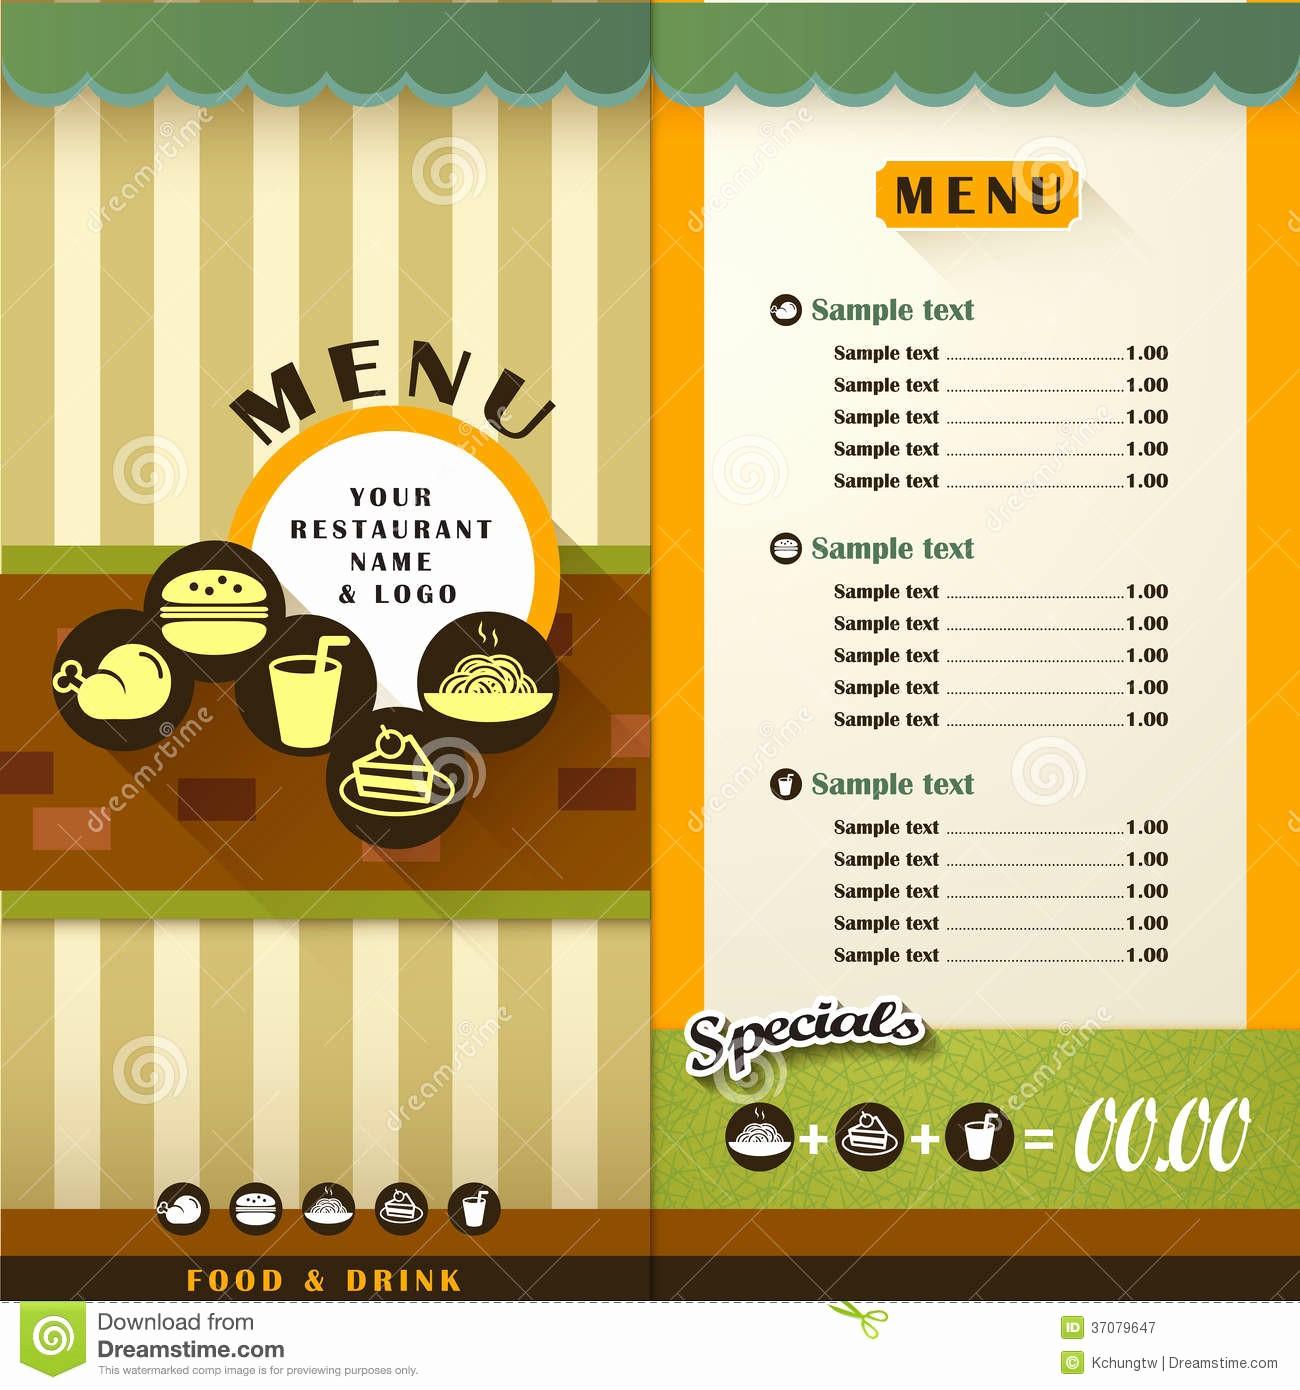 Menu Card Template Free Download Inspirational Restaurant Menu Stock Vector Illustration Of Cooking